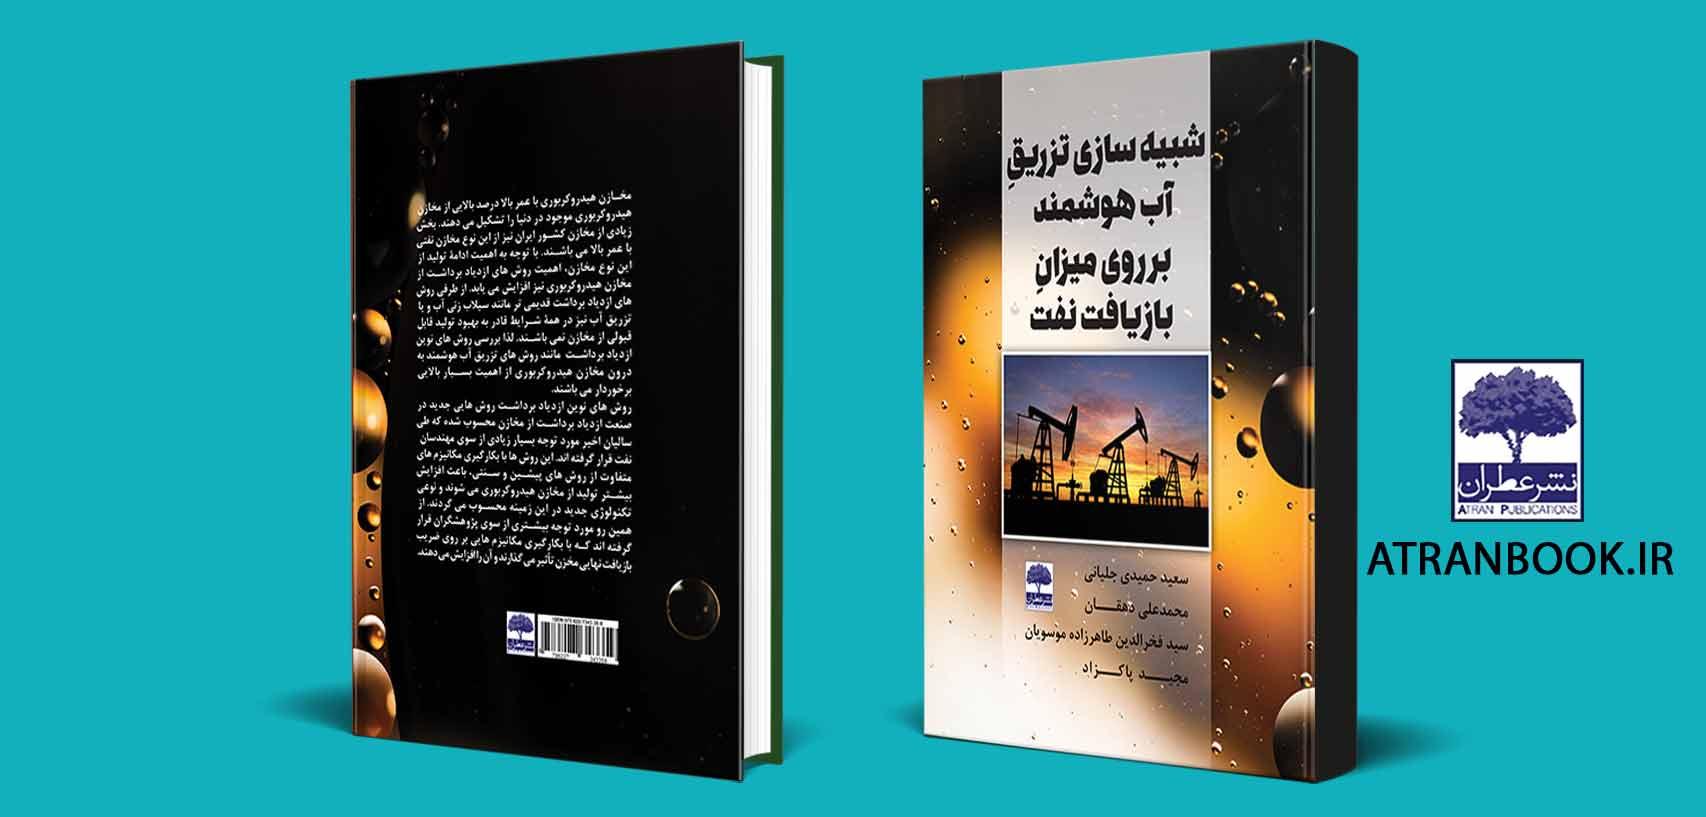 انتشارات عطران: کتاب